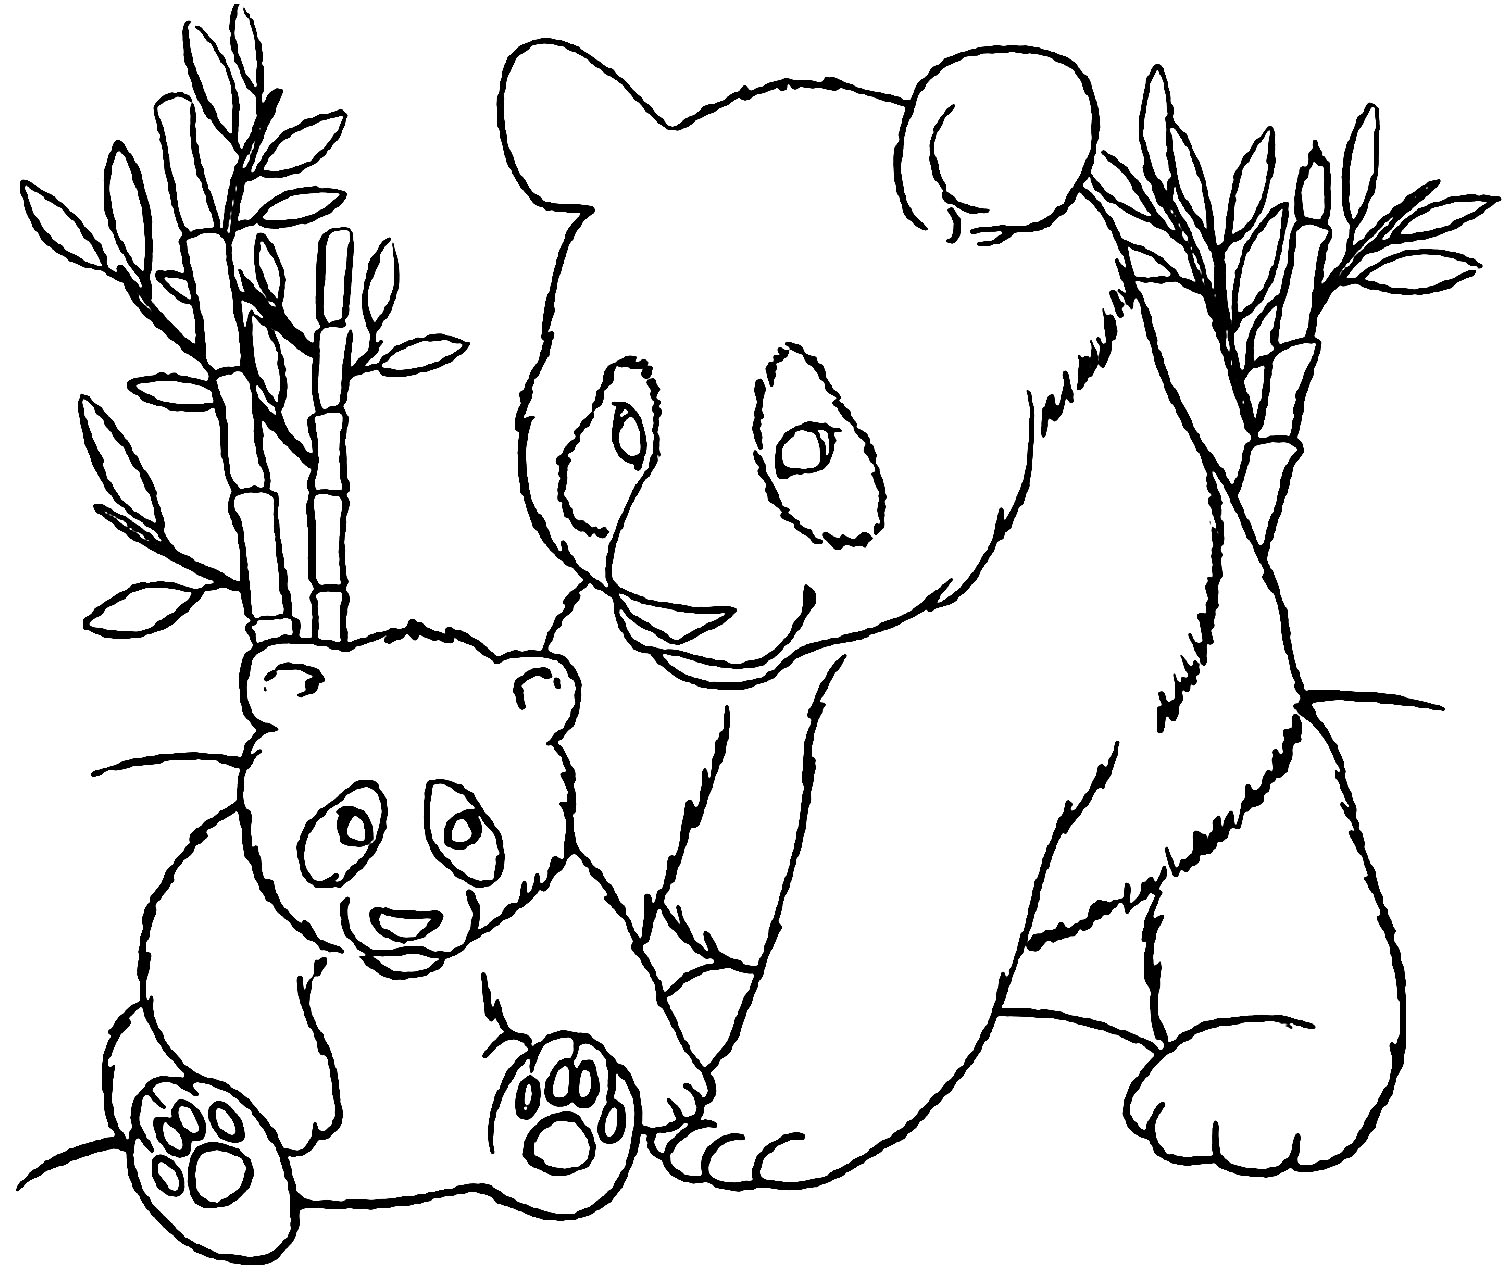 Pandas to print - Pandas Kids Coloring Pages